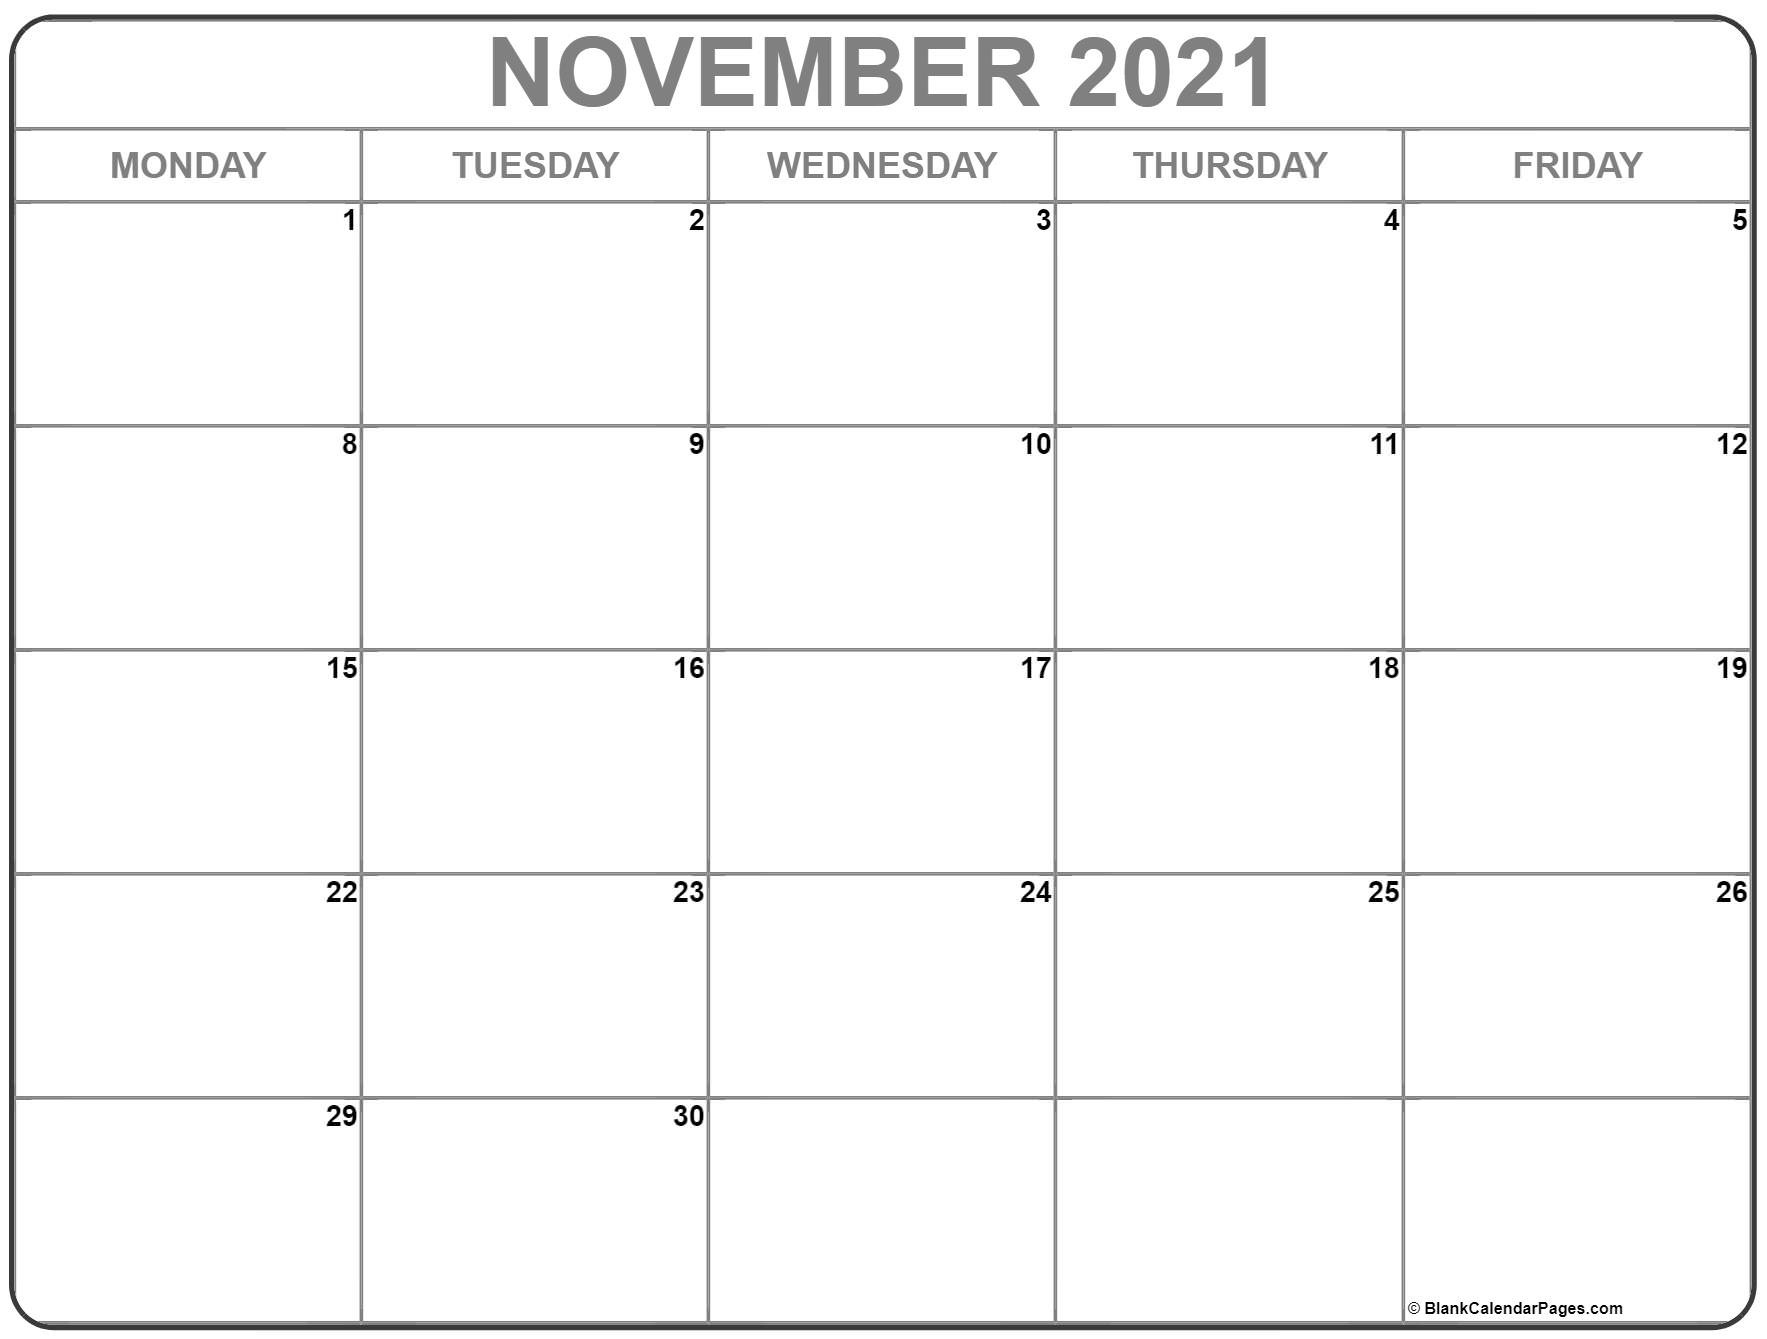 November 2021 Monday Calendar | Monday To Sunday-Sunday To Saturday Calendar 2021 Printable